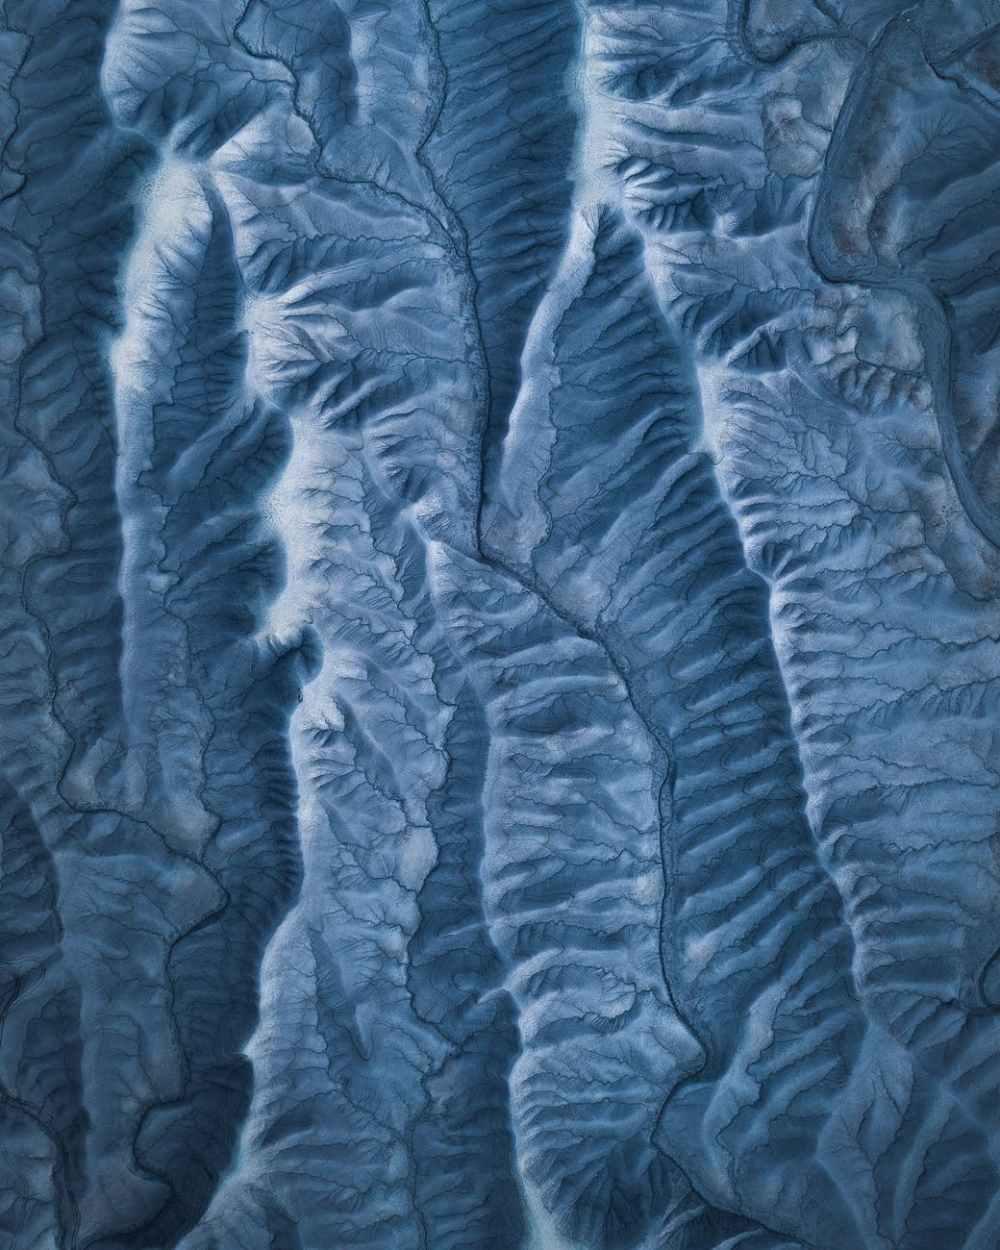 frozen lands